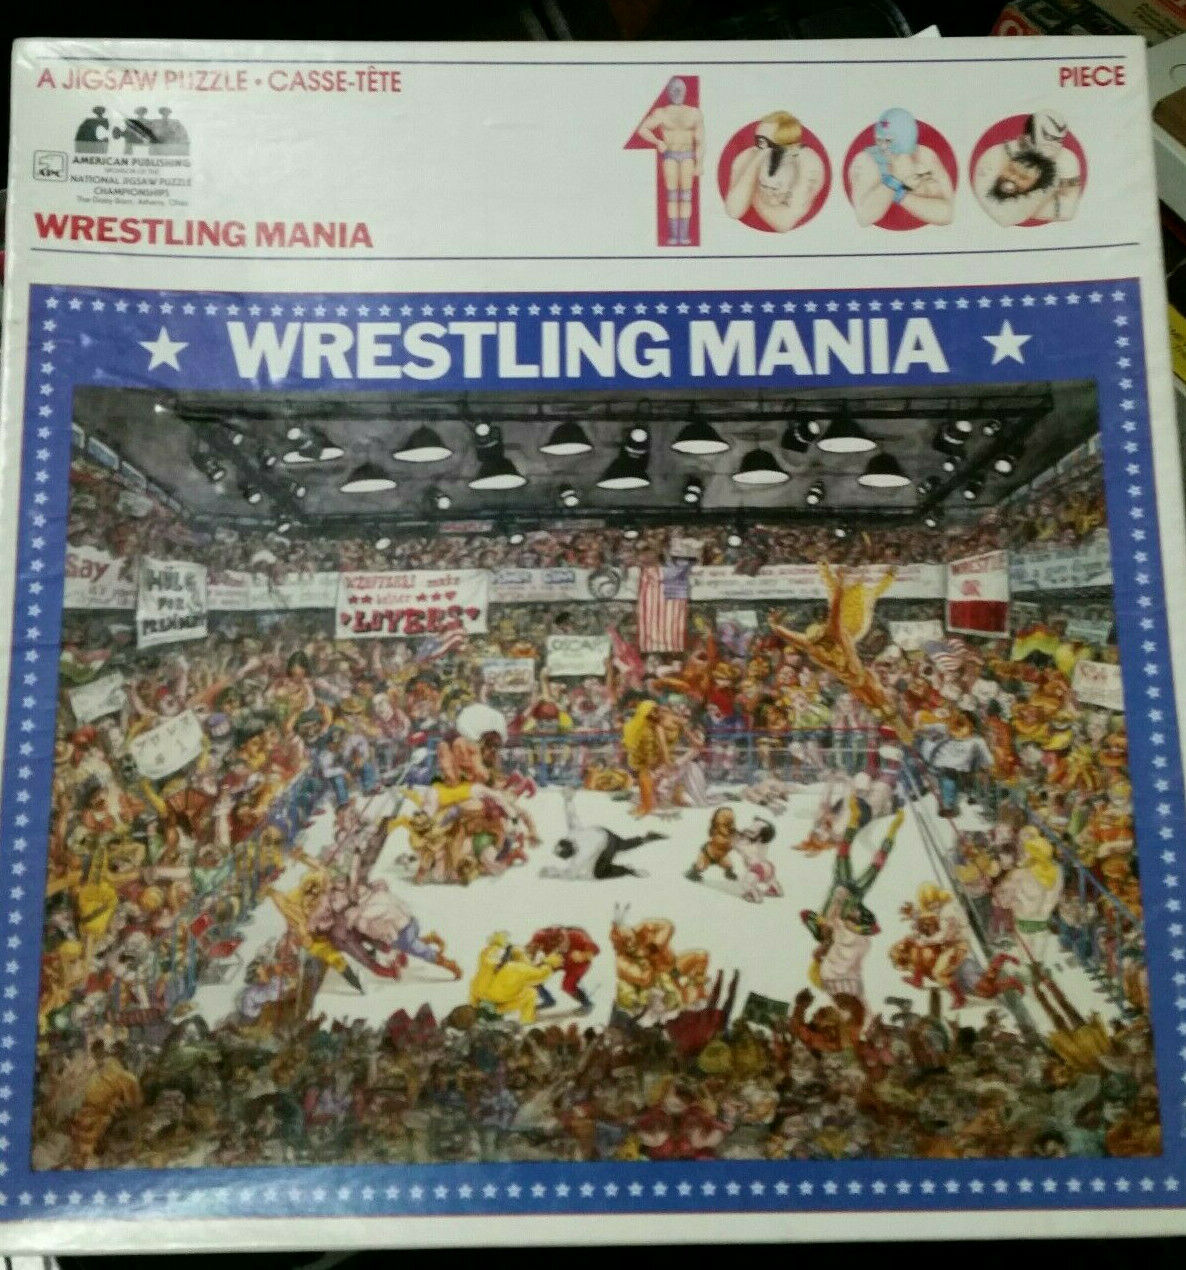 1984  American Publishing 1000pc Puzzle-WRESTLING uomoIA-23x29-Great Illustrations  Felice shopping